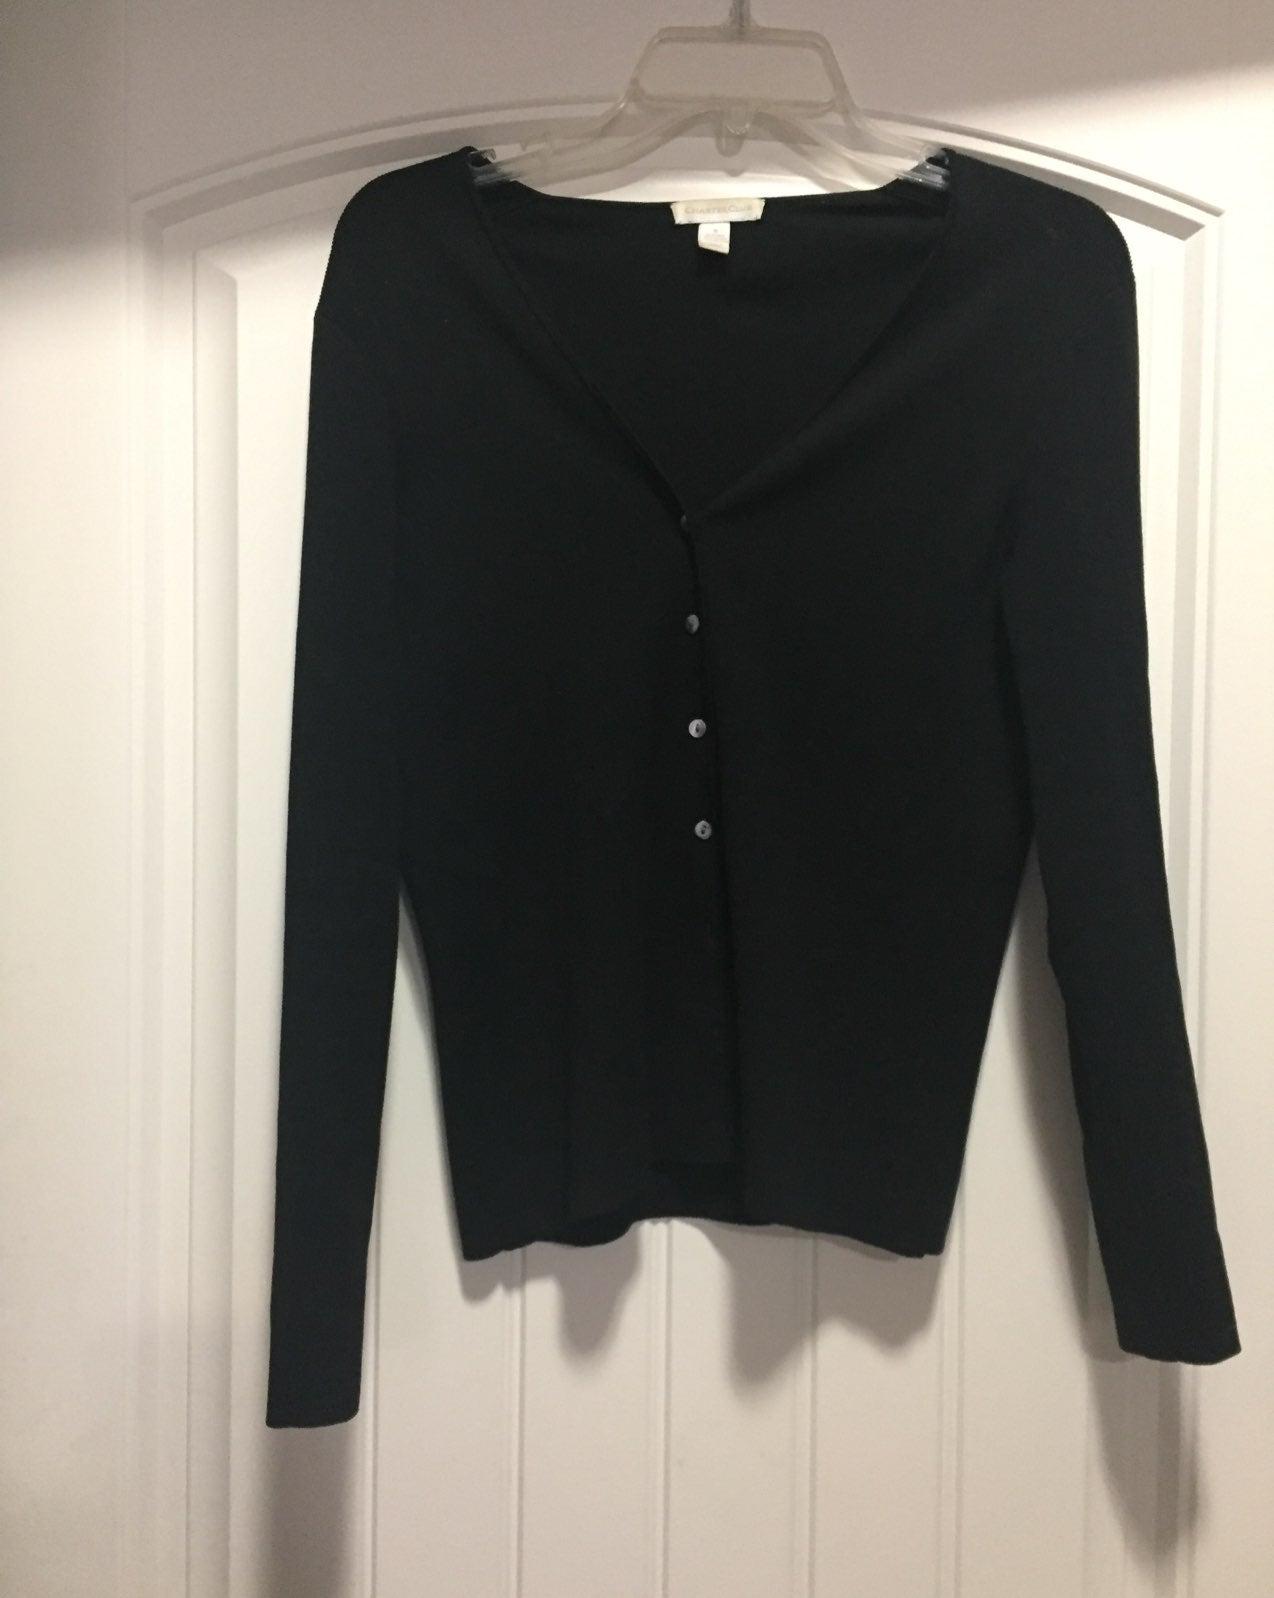 Black Cardigan Sweater small - Mercari: BUY & SELL THINGS YOU LOVE